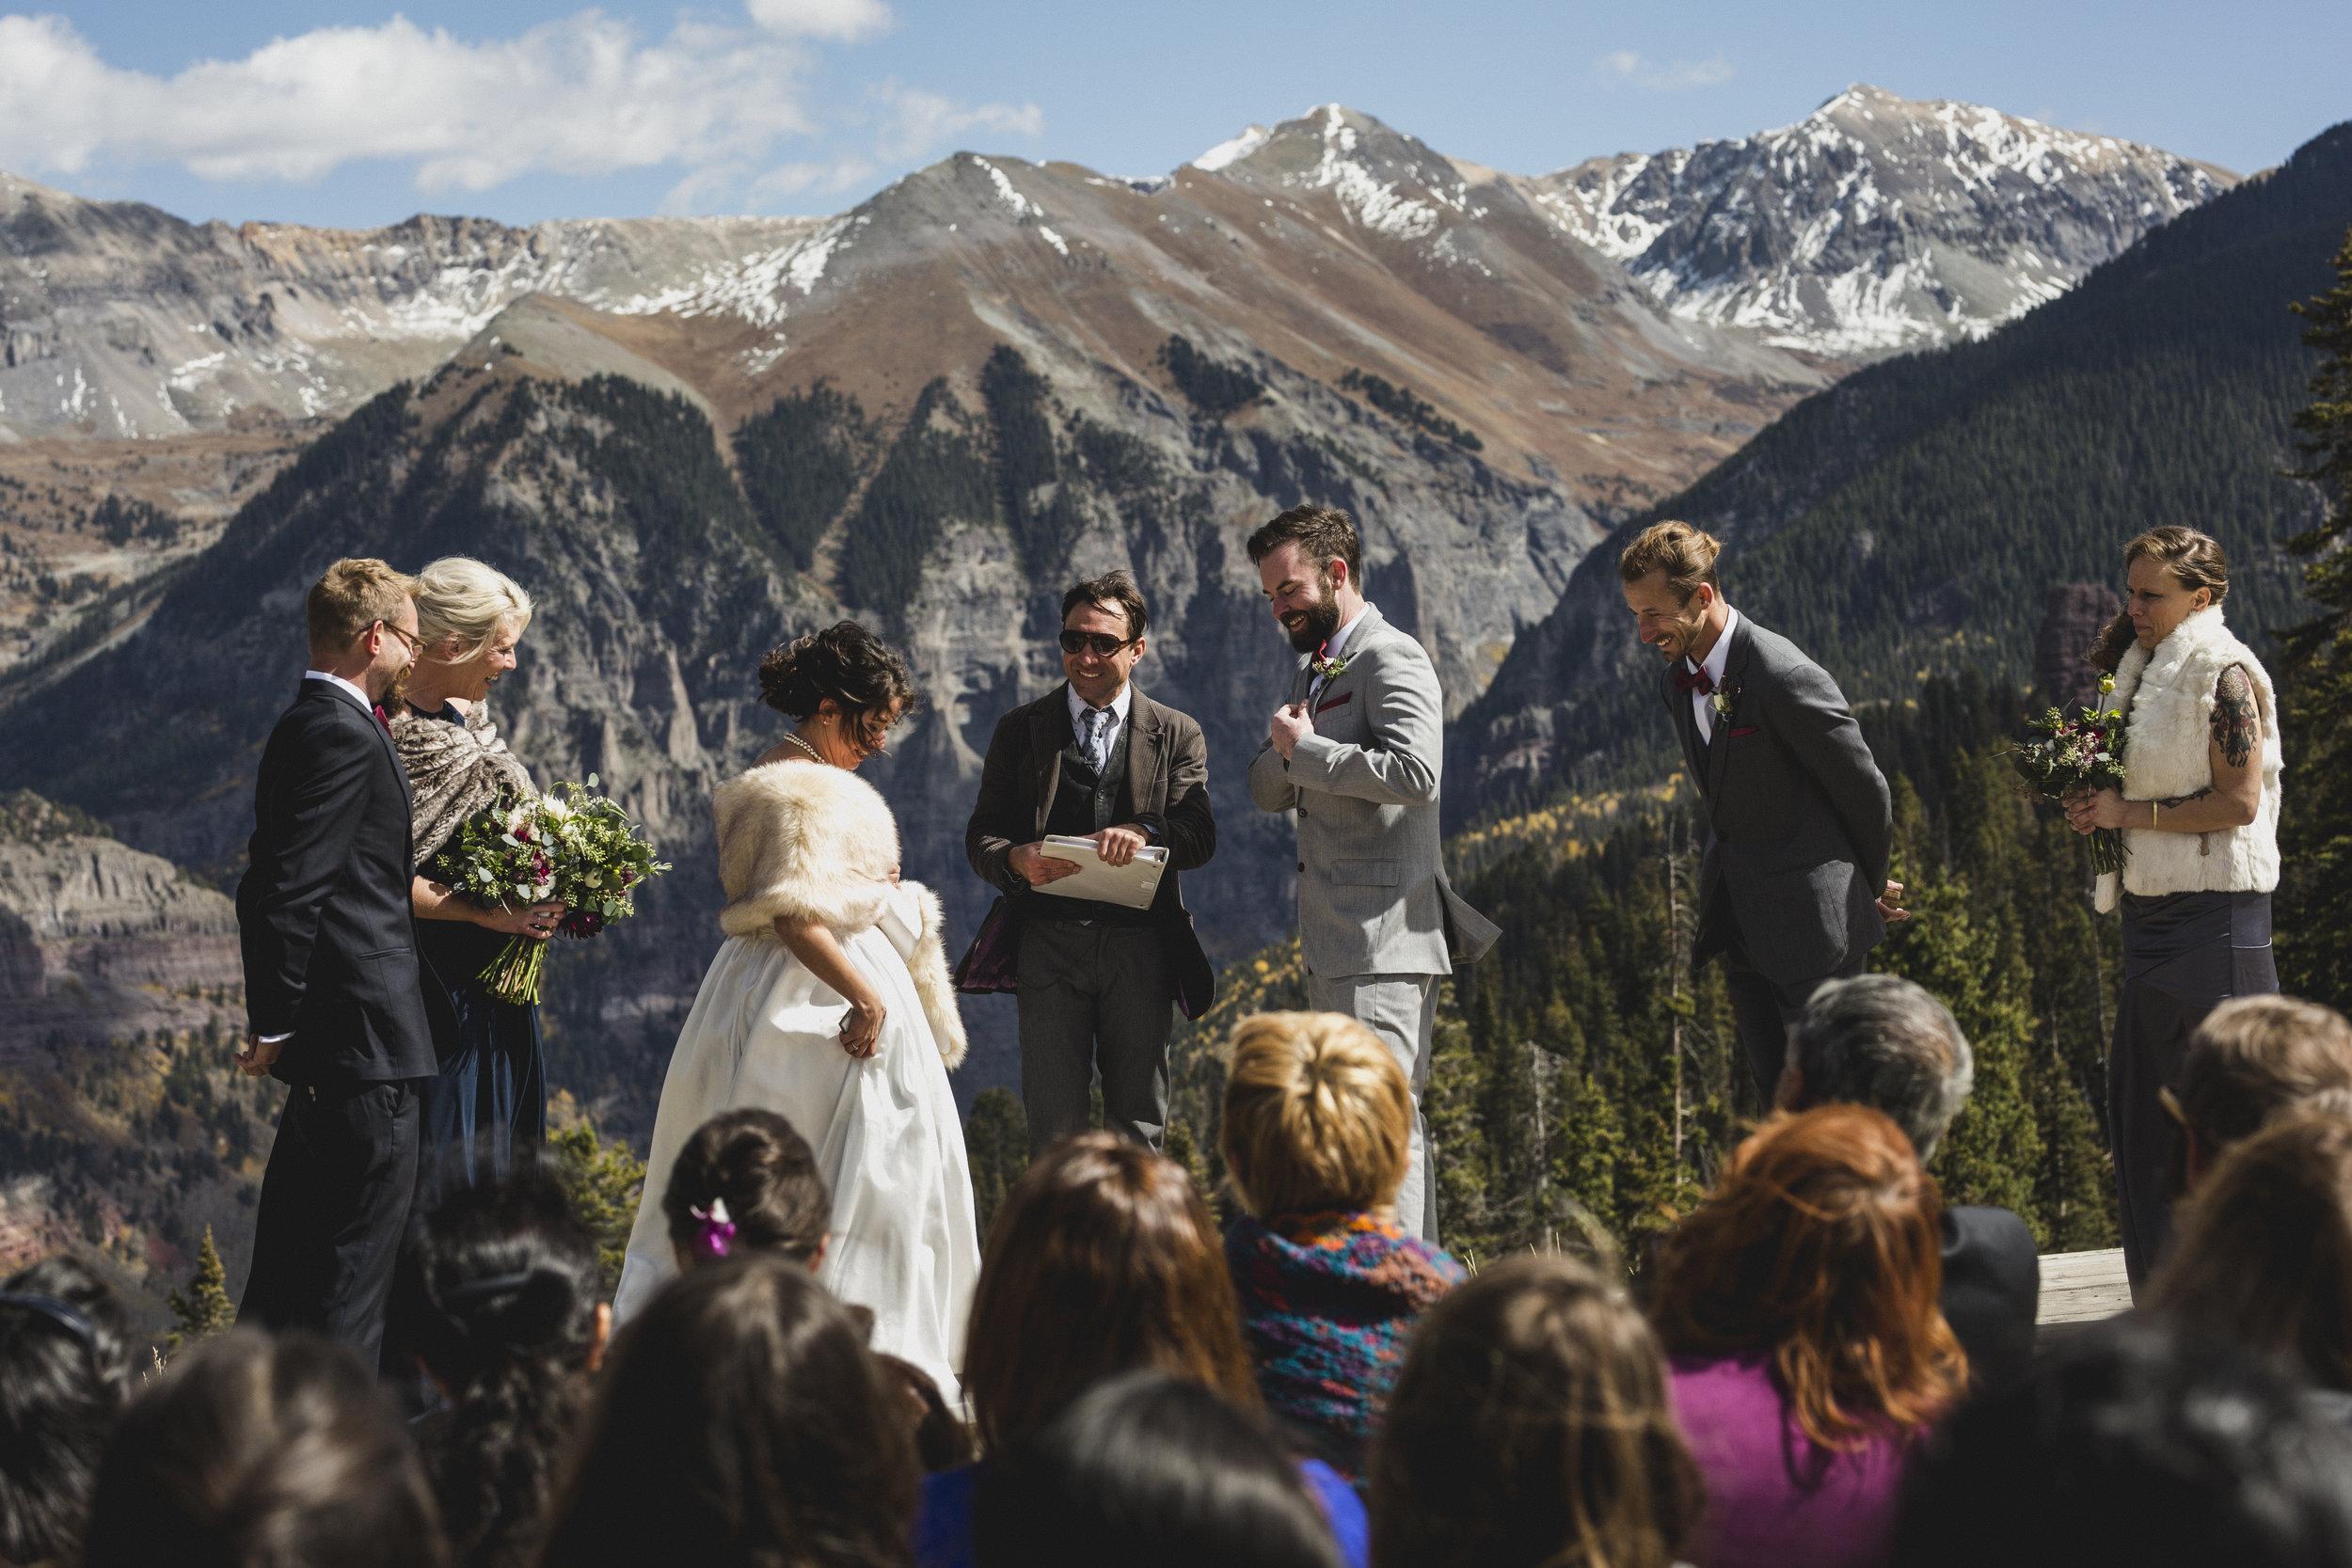 NE-LeahandAshtonphotography-Telluride-Wedding-Photography-9372.jpg